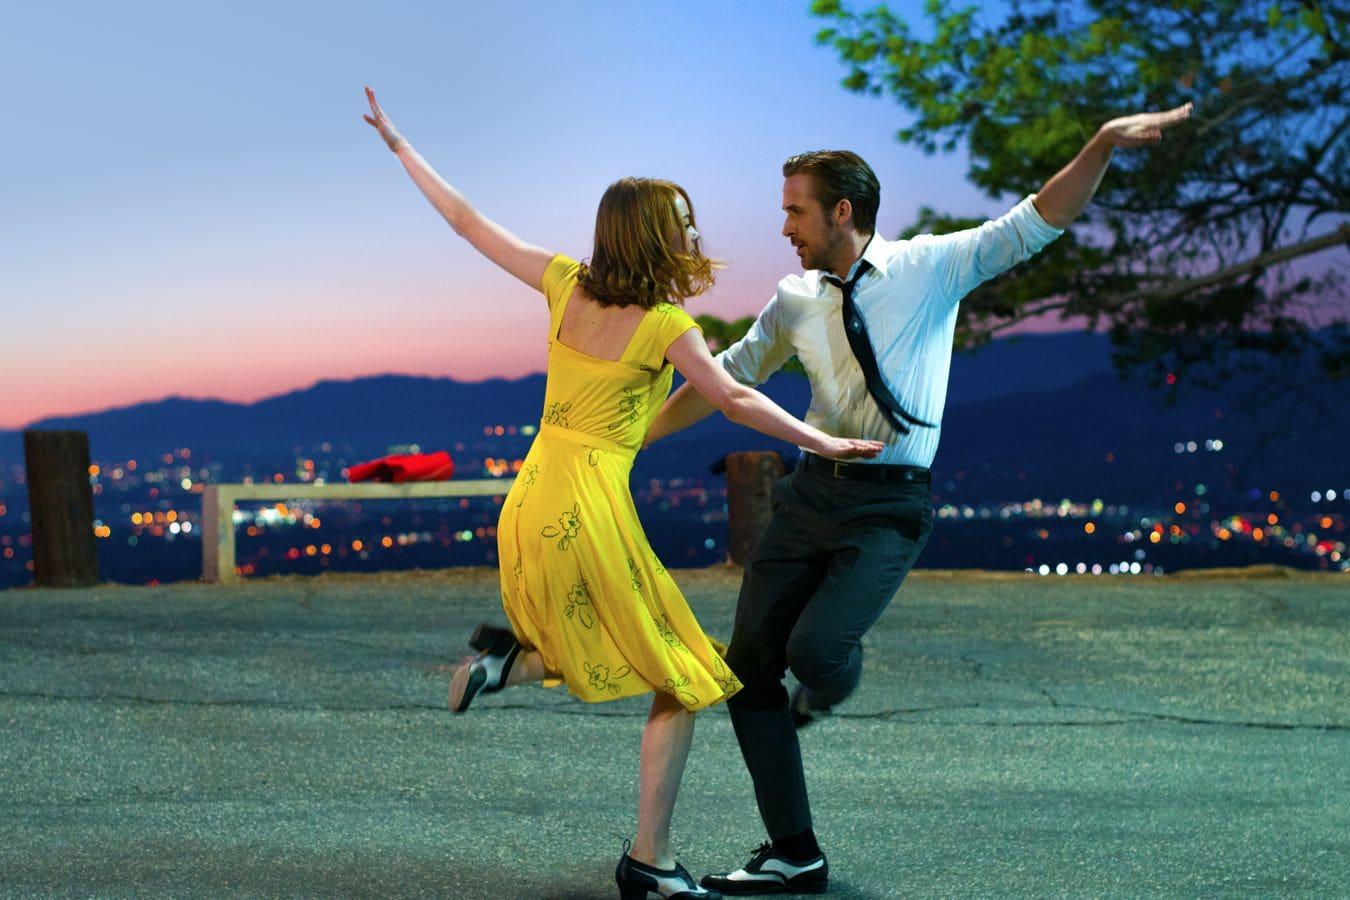 Emma Stone and Ryan Gosling dancing in the movie La La Land